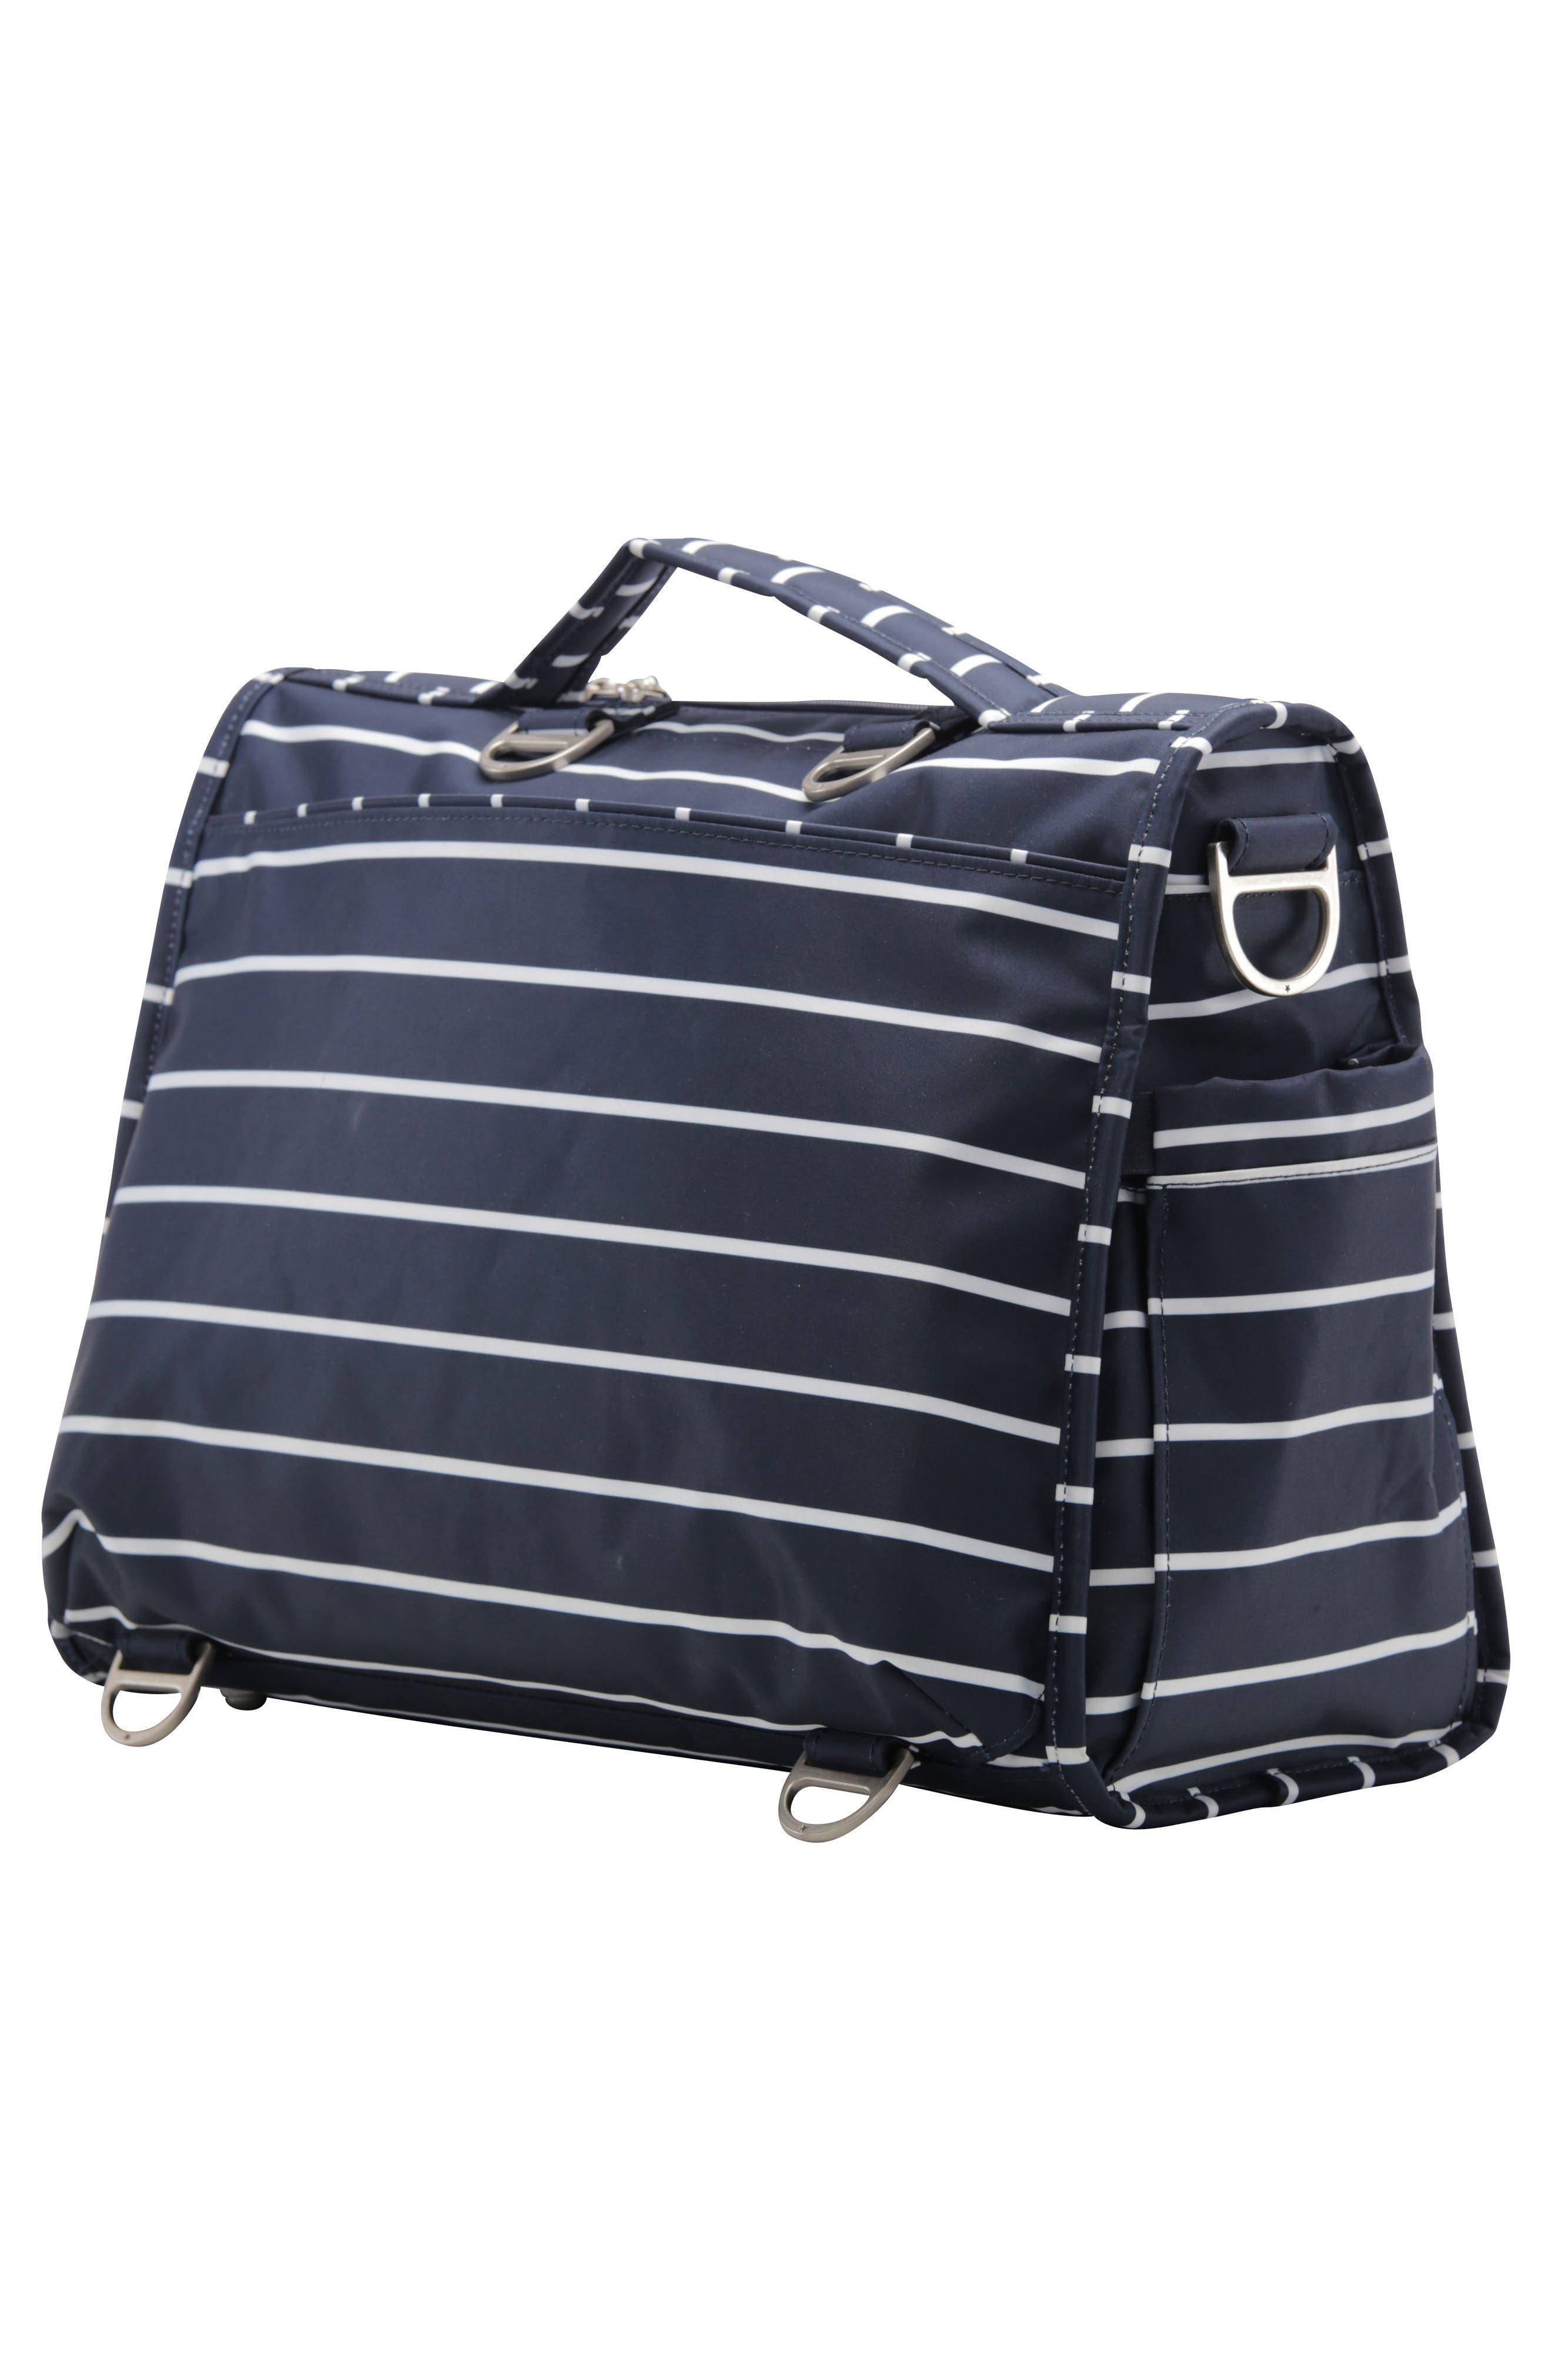 BFF - Coastal Collection Diaper Bag,                             Alternate thumbnail 25, color,